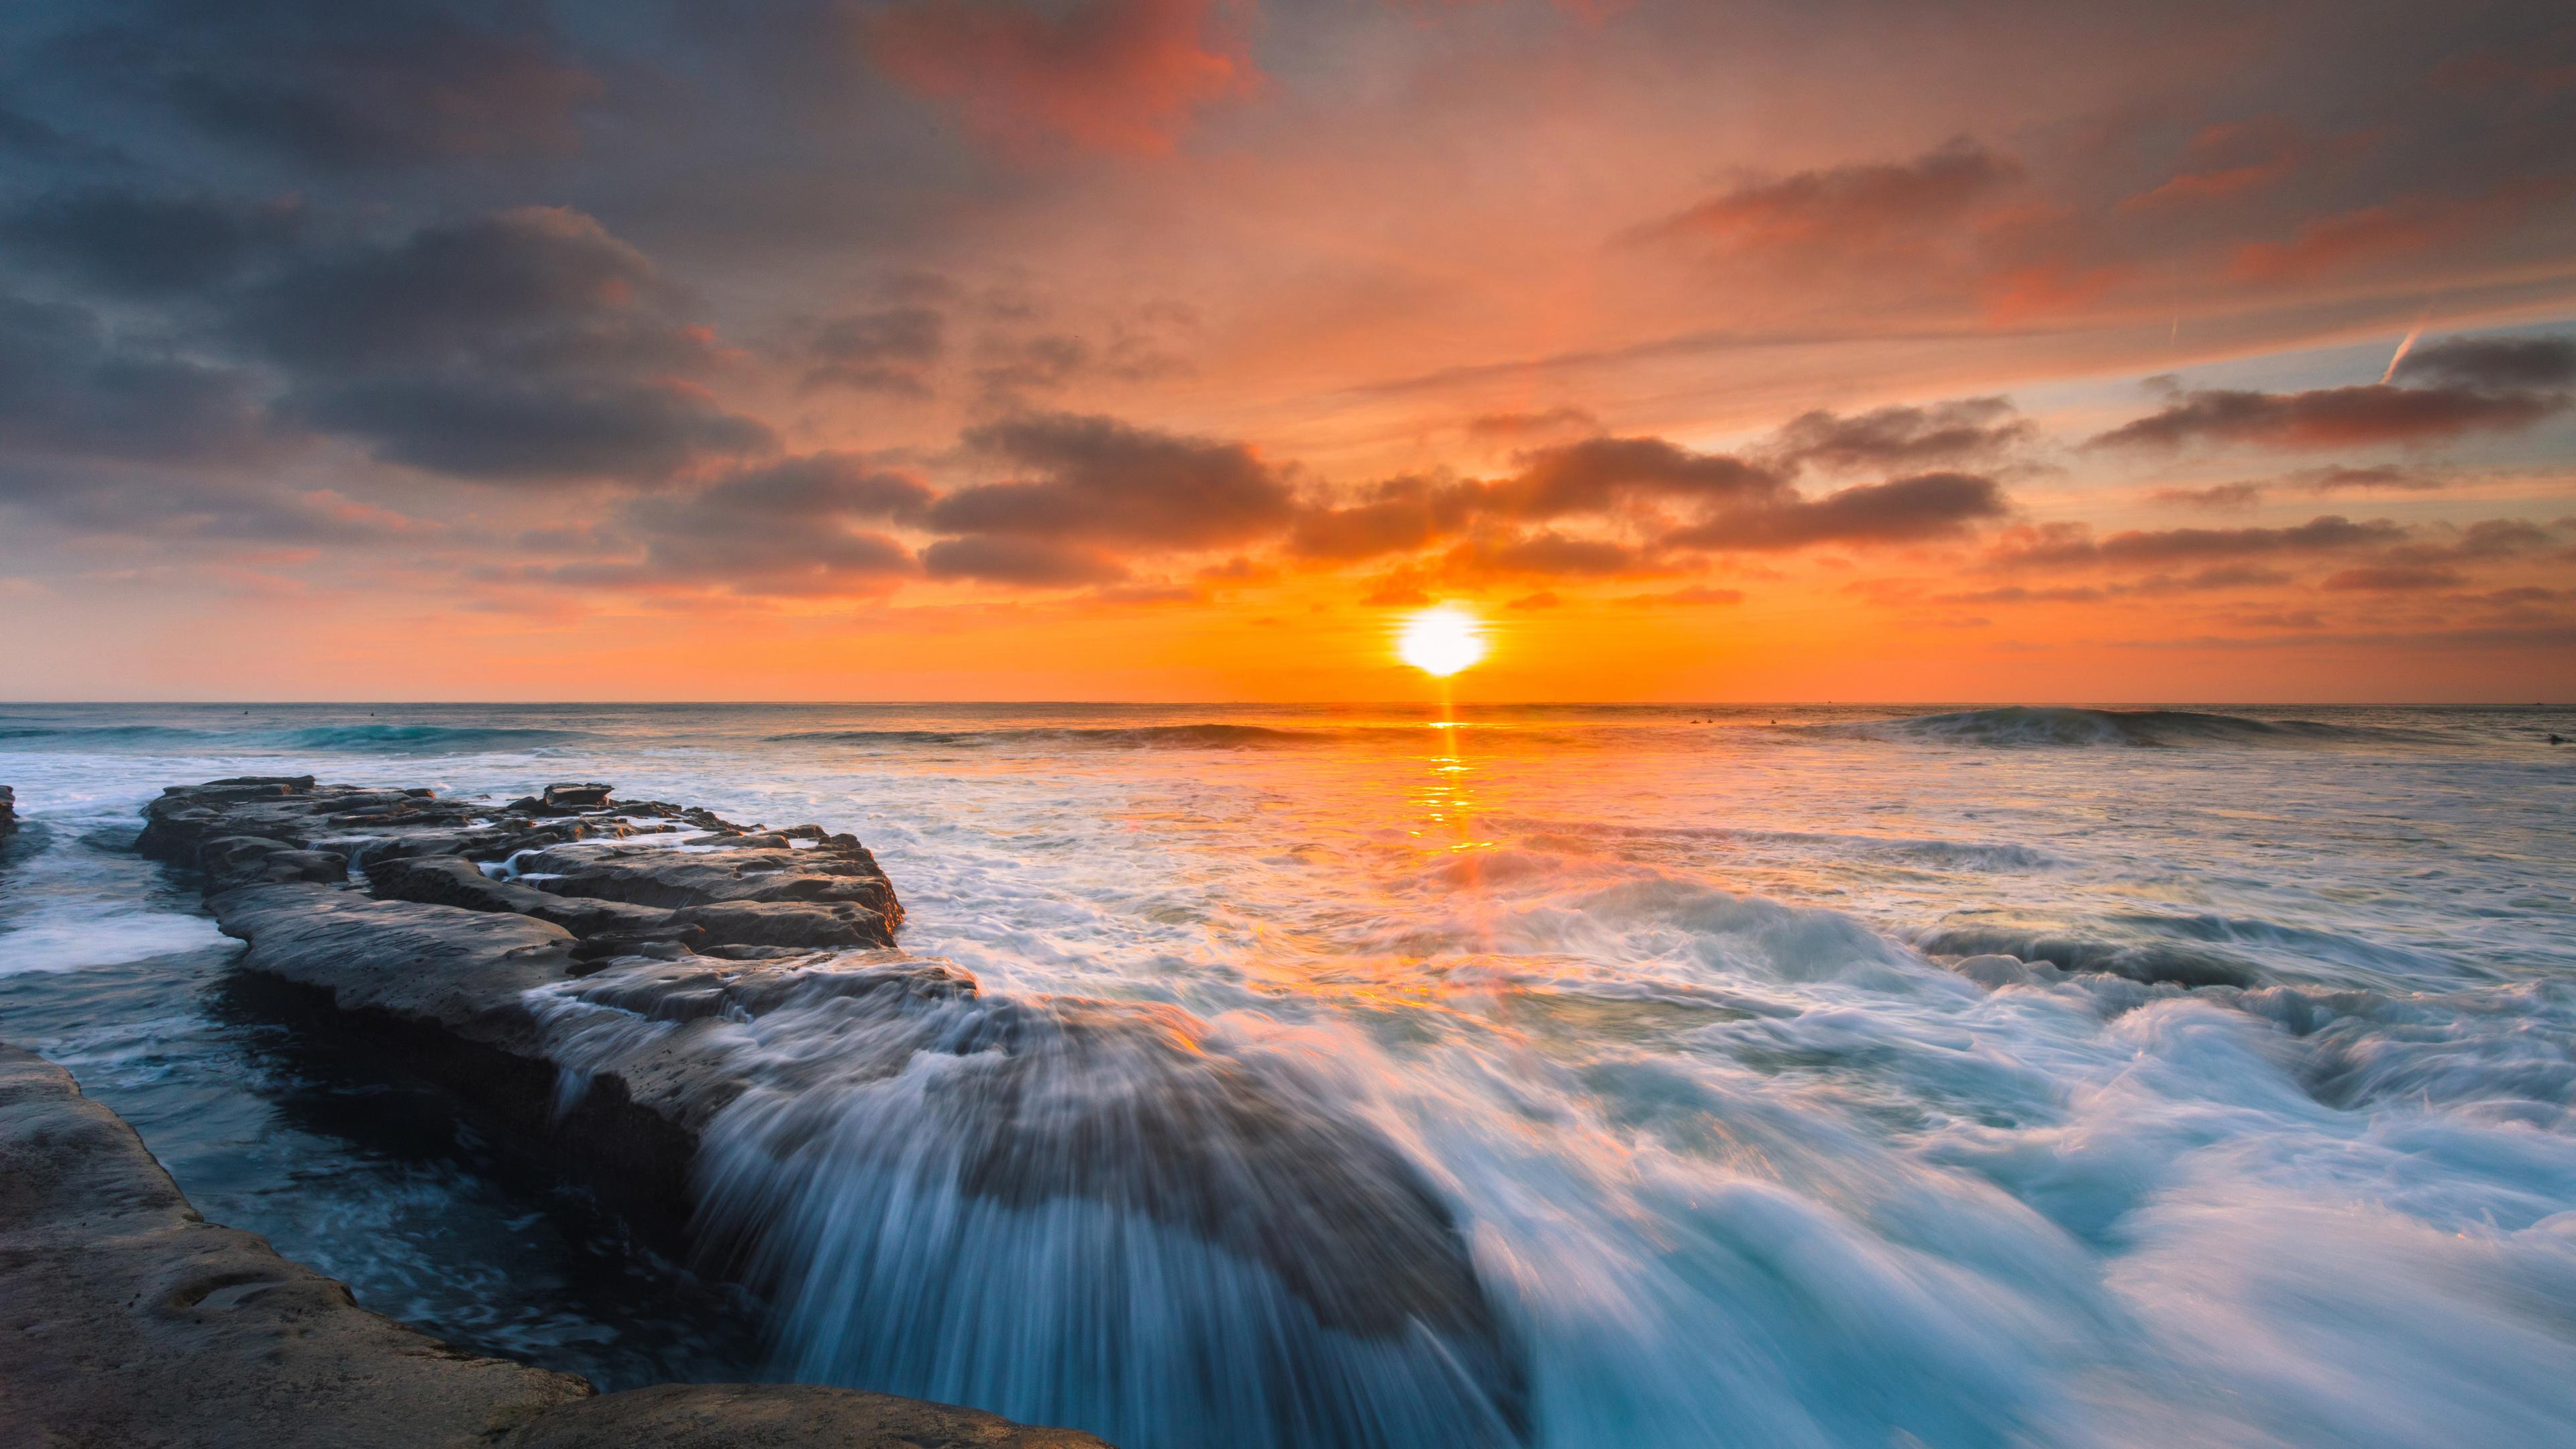 Оранжево-золотой закат солнца